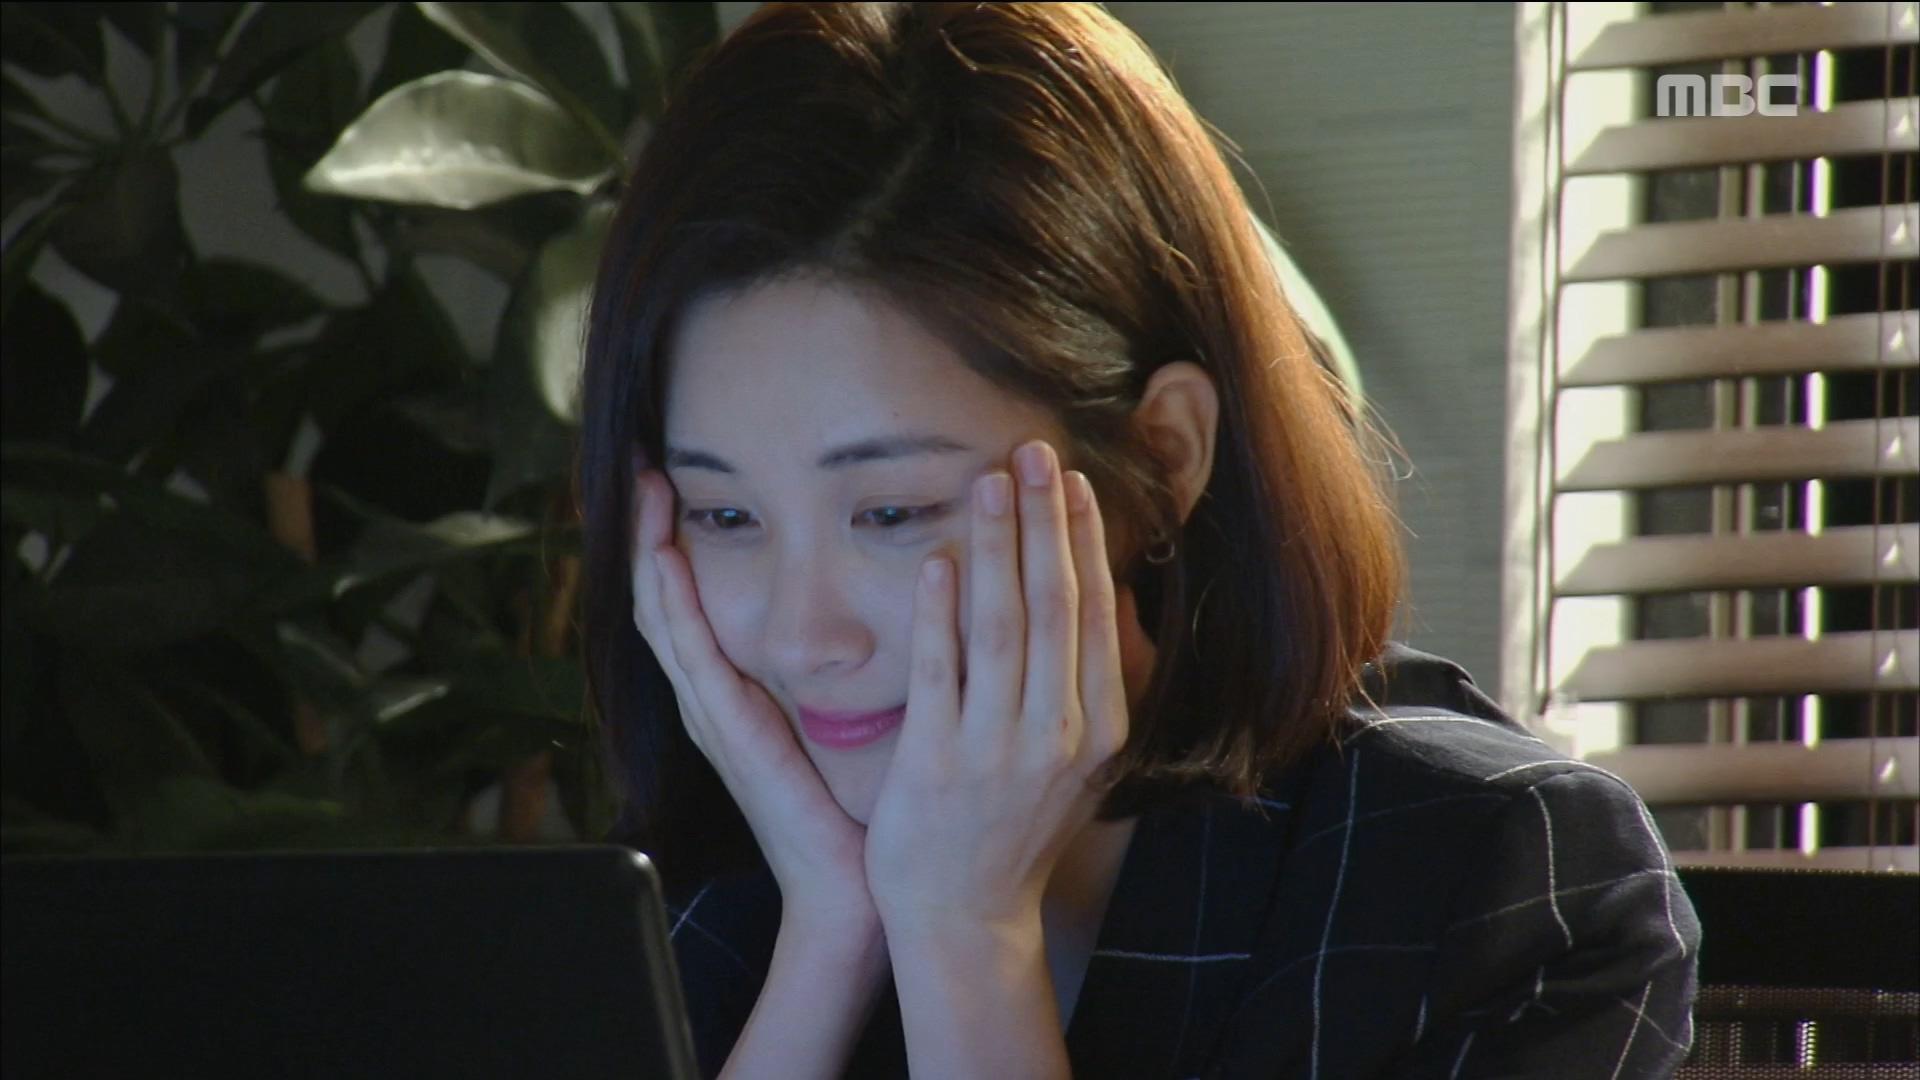 J와 채팅에 설레는 서주현?!